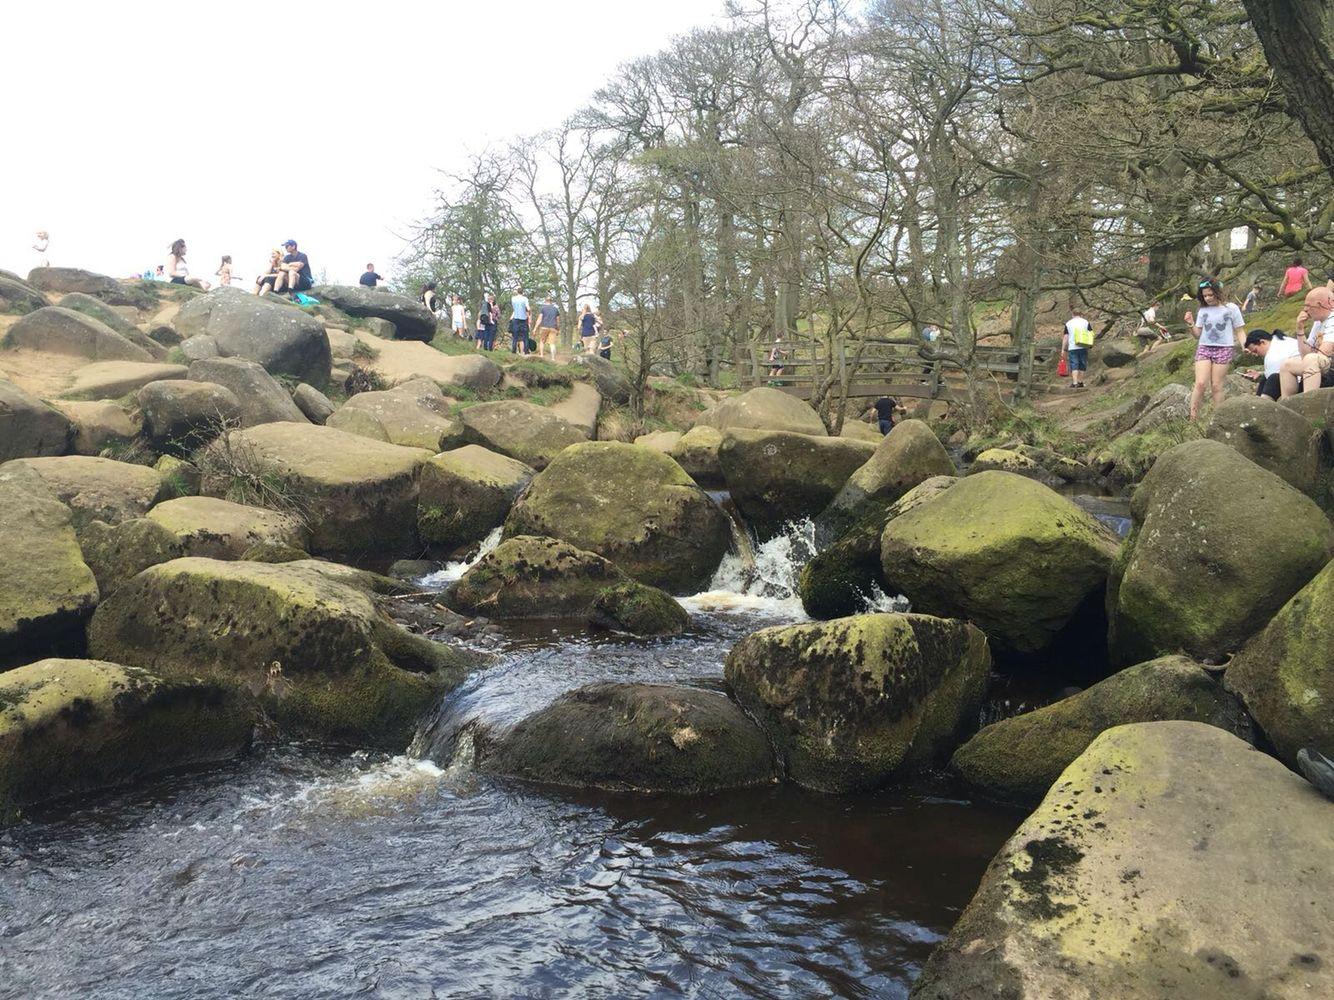 #padley #gorge #derbyshire #hope #valley #peak #district #foxhouse #longshawestate #walk #water #rocks #climbing #run #summer #explore #nature #beautiful